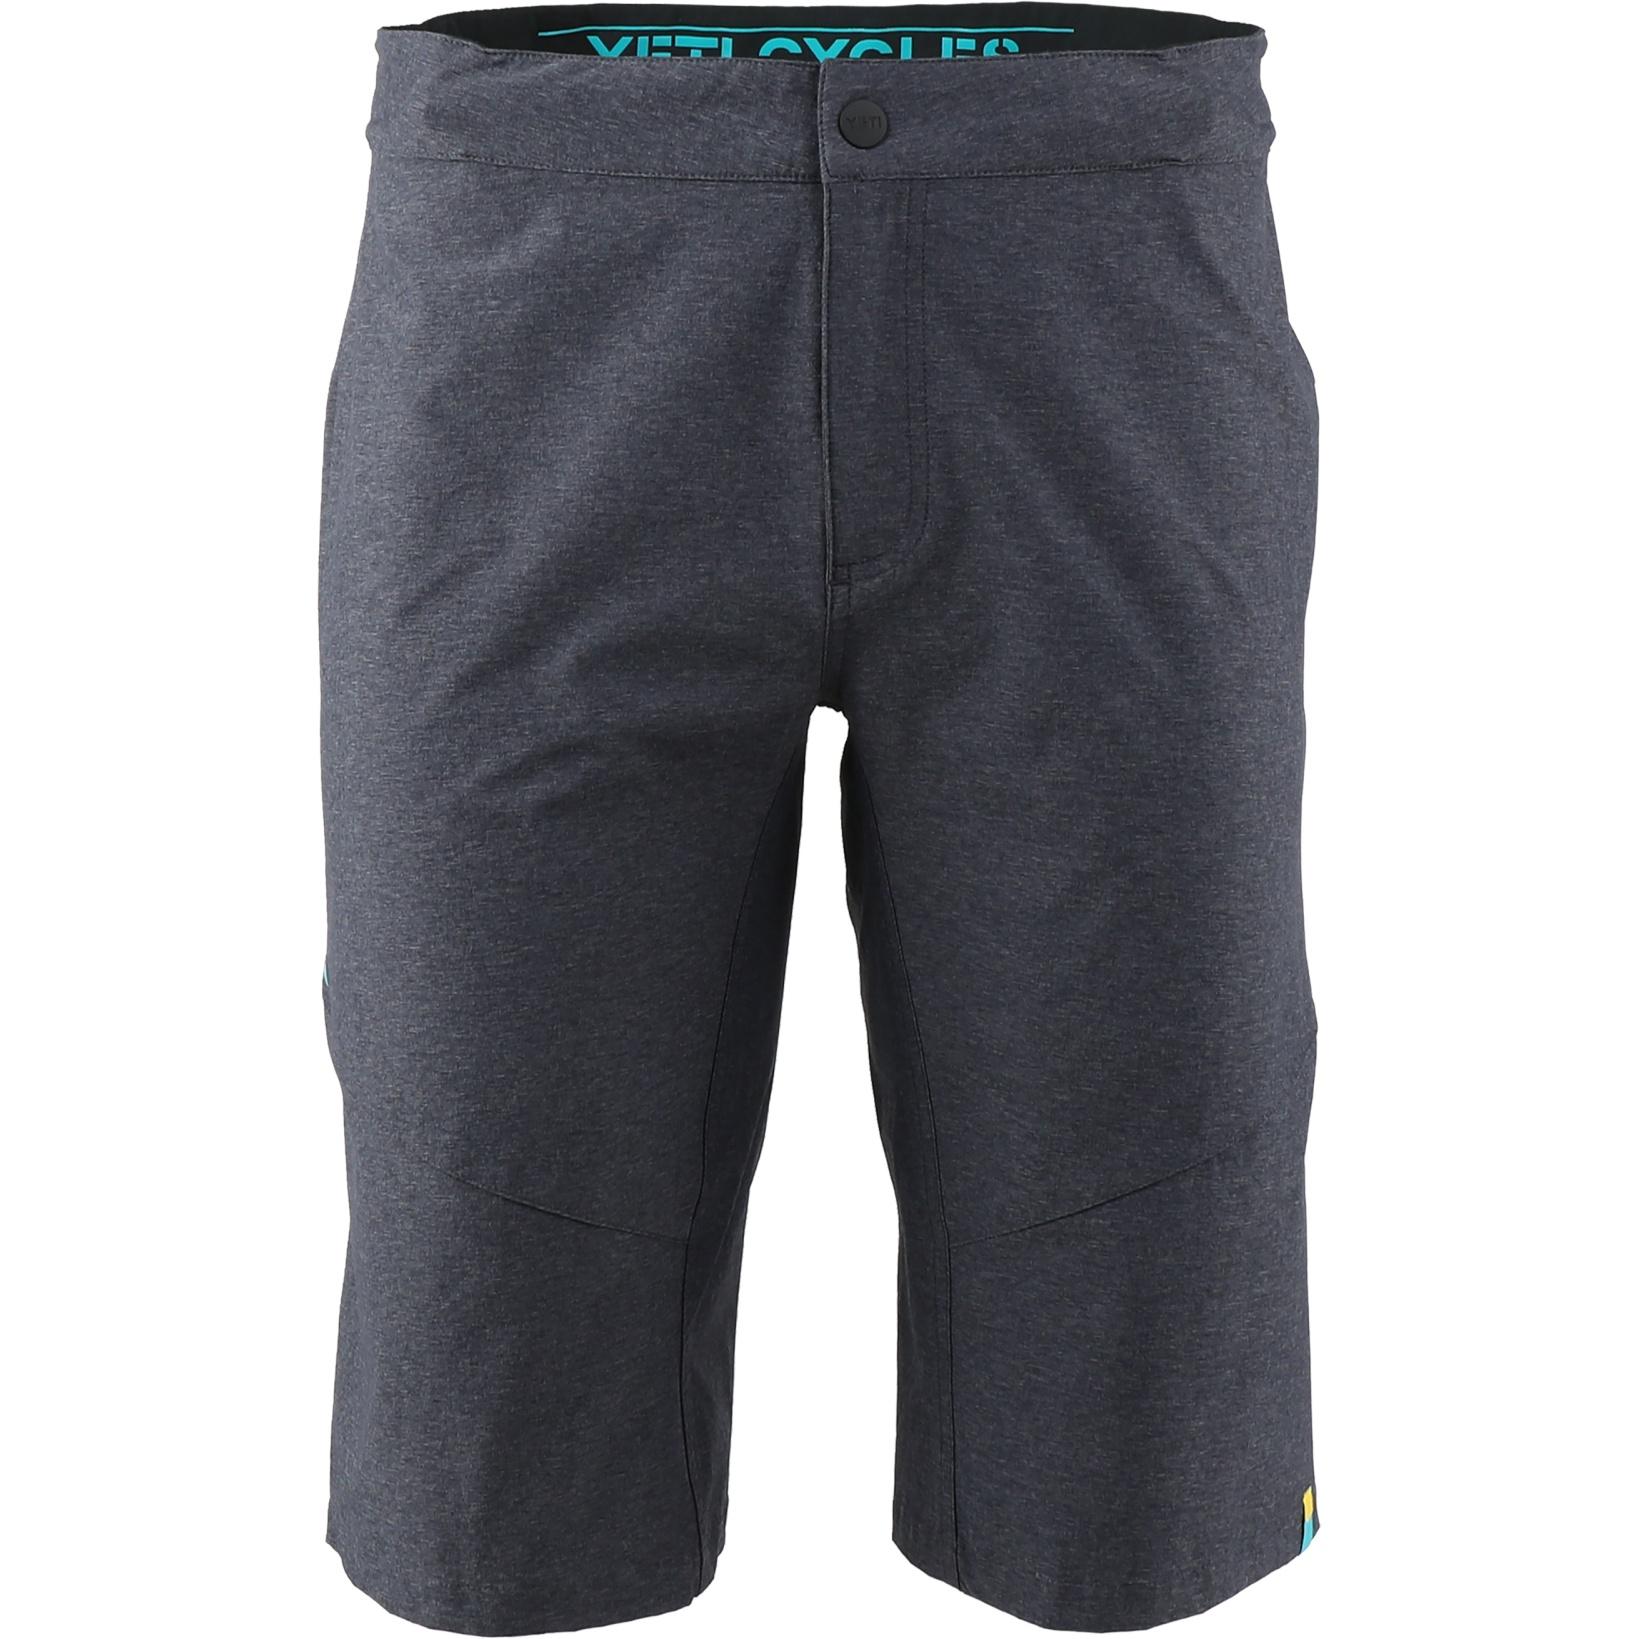 Yeti Cycles Mason Shorts - Black